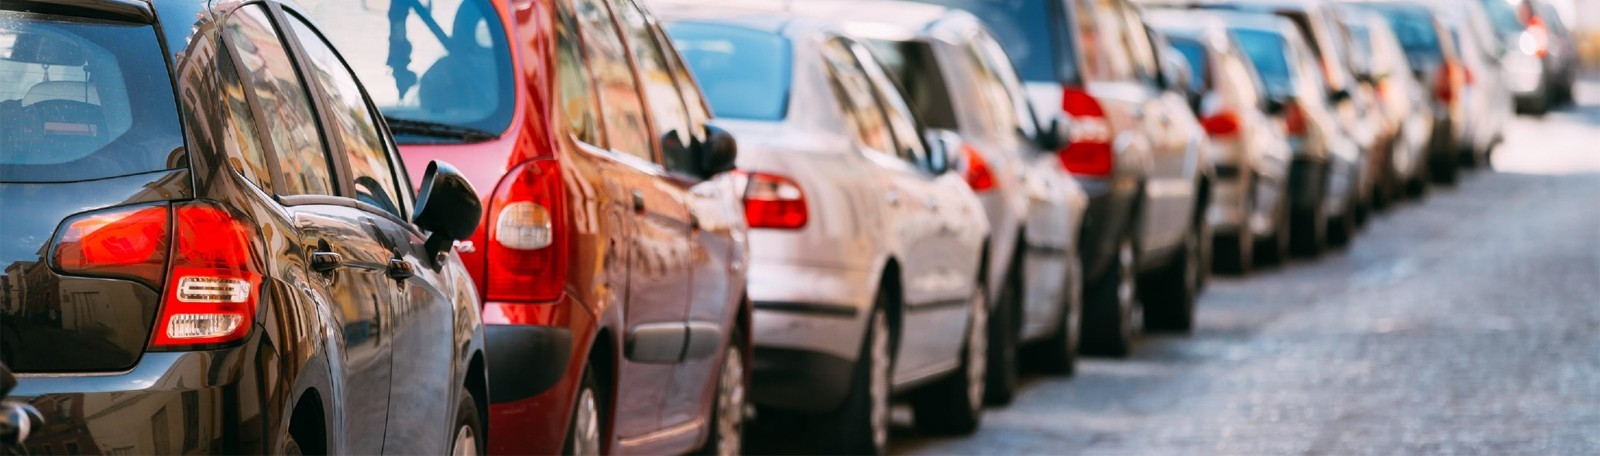 Algemene Gebruiksvoorwaarden Voirie - Q-Park Résa: reserveer uw parking met enkele klikken!